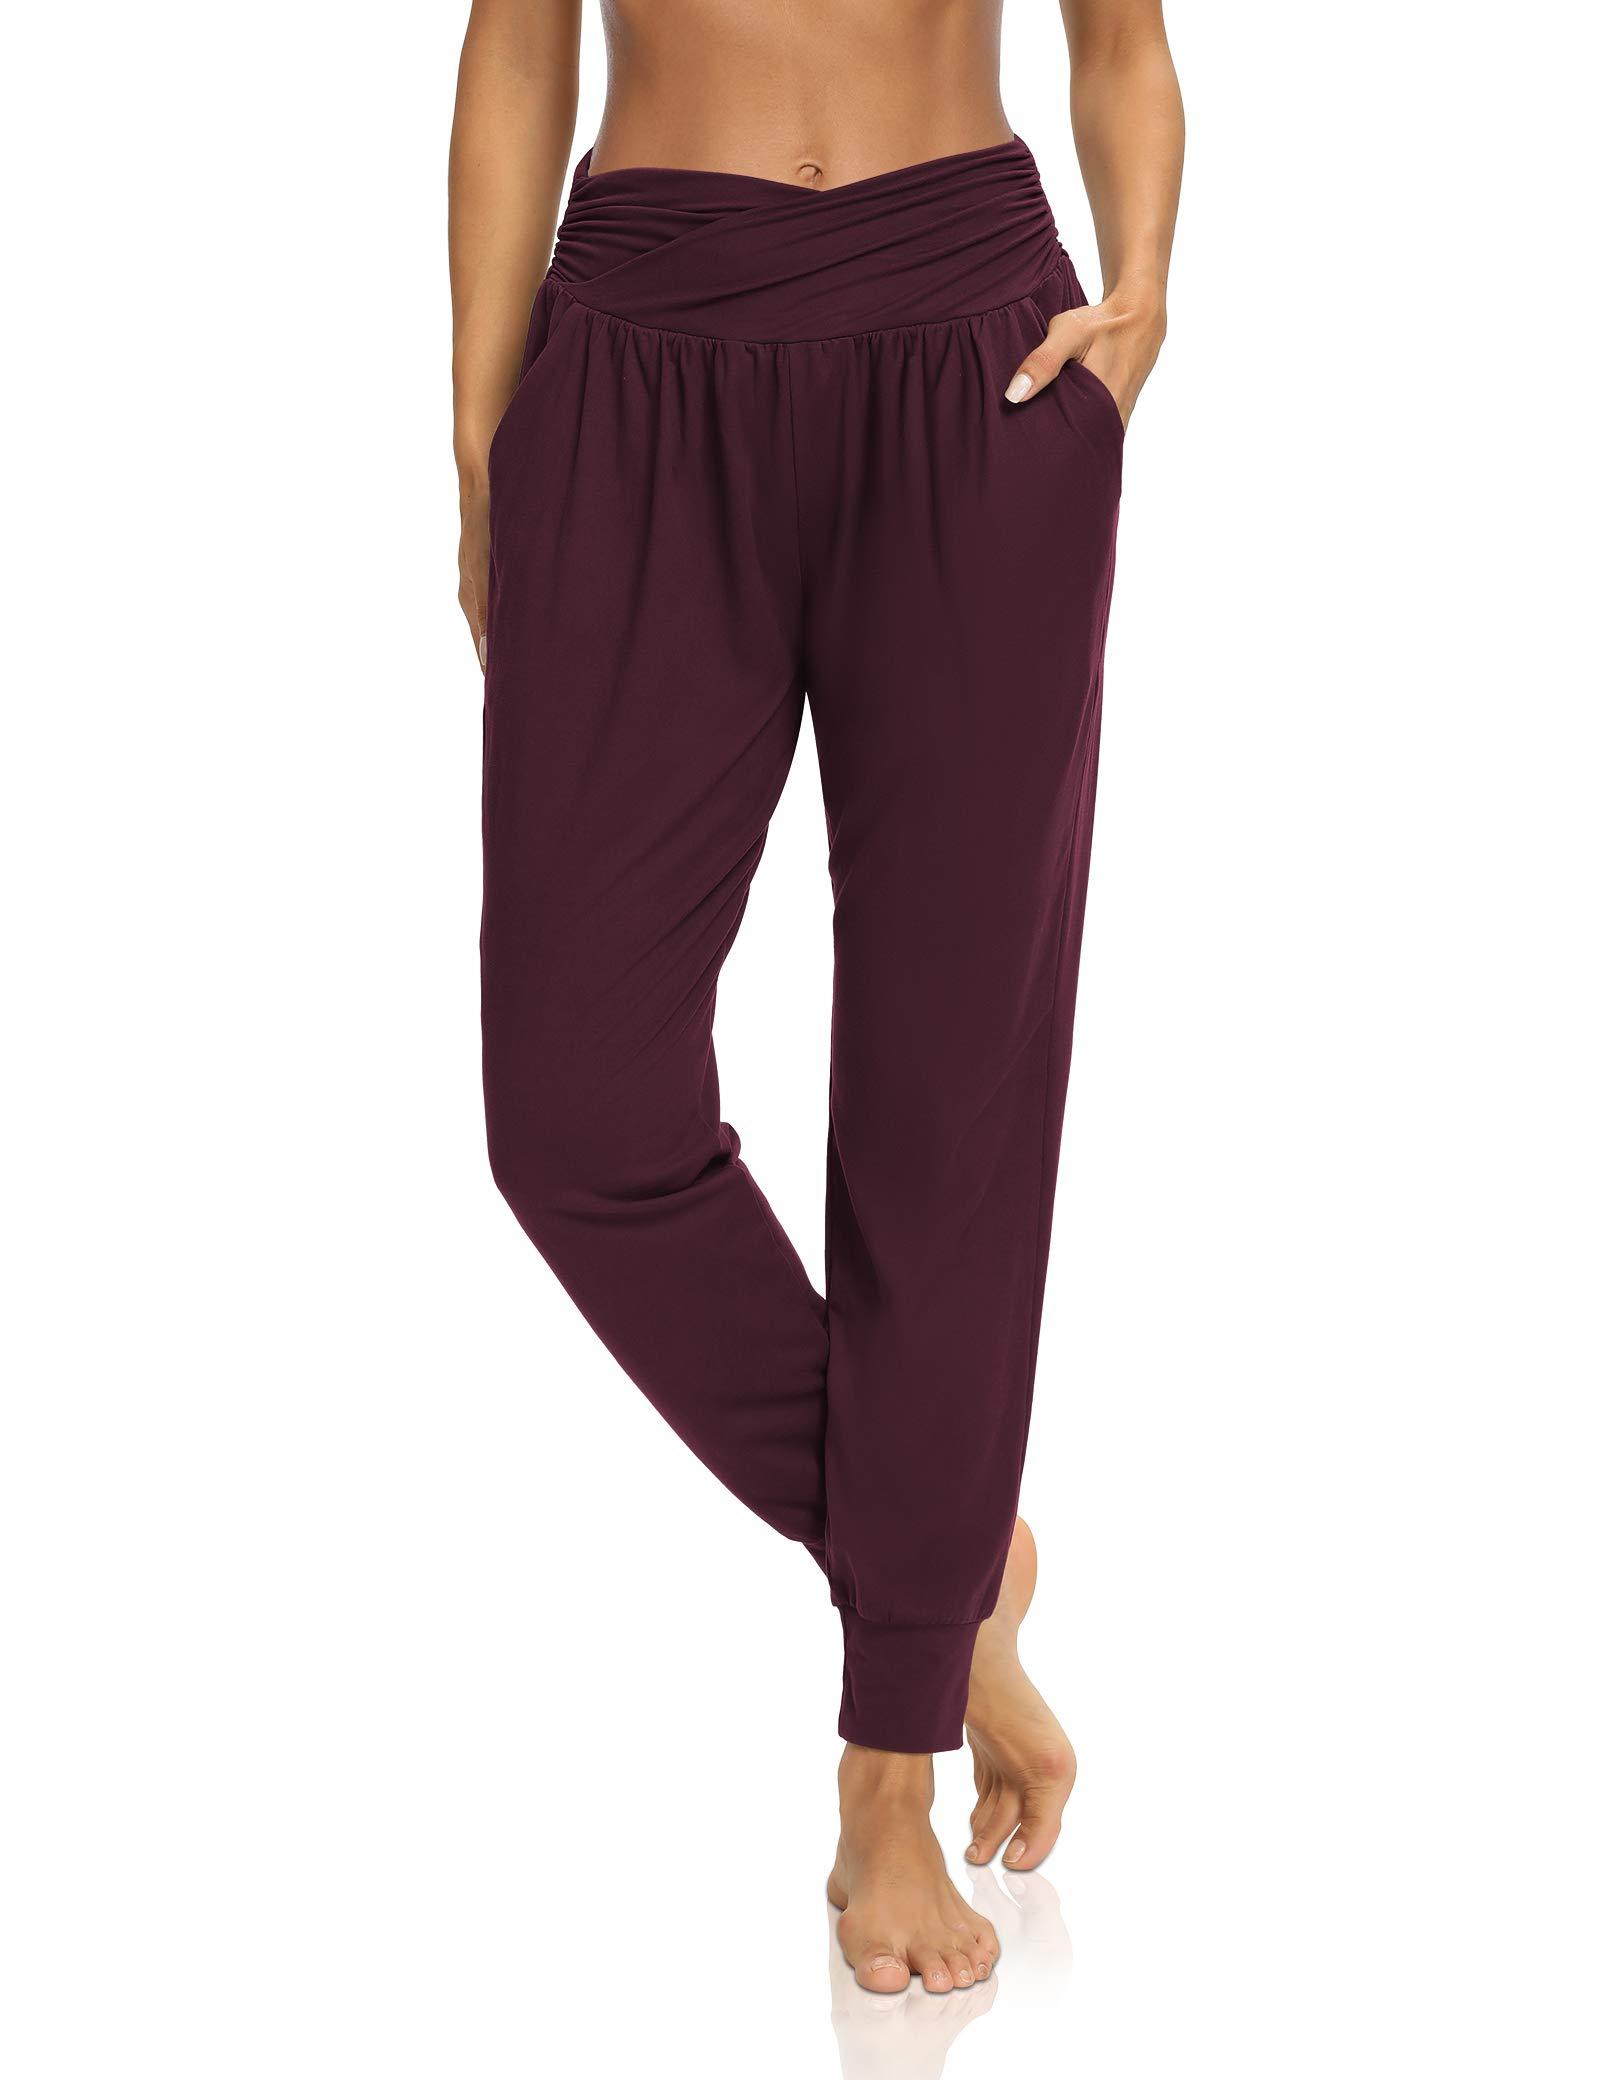 DIBAOLONG Womens Yoga Sweatpants Loose Workout Harem Joggers Casual Comfy Lounge Pajama Pants with Pockets